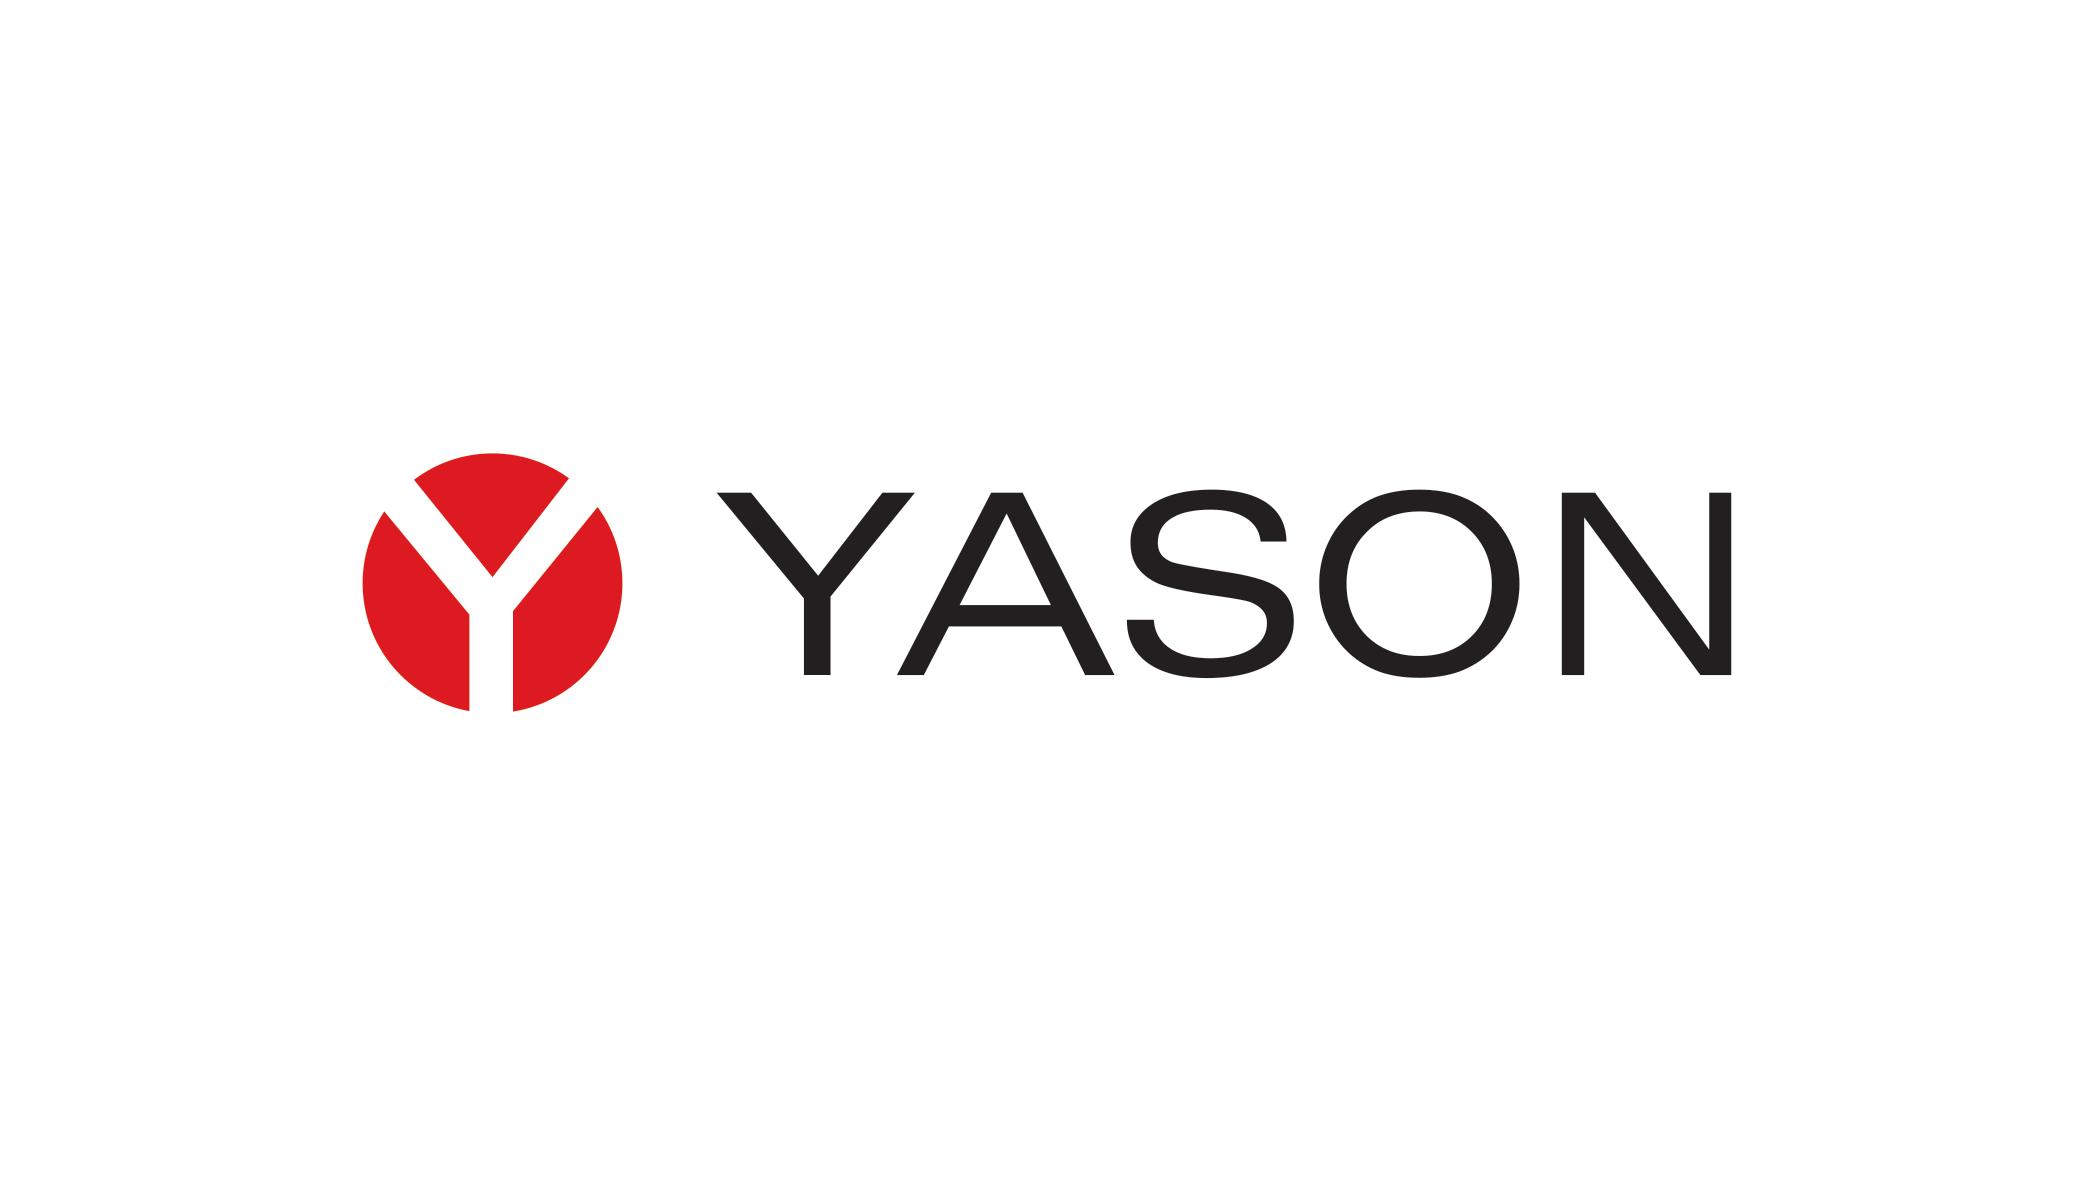 yason logo 2021